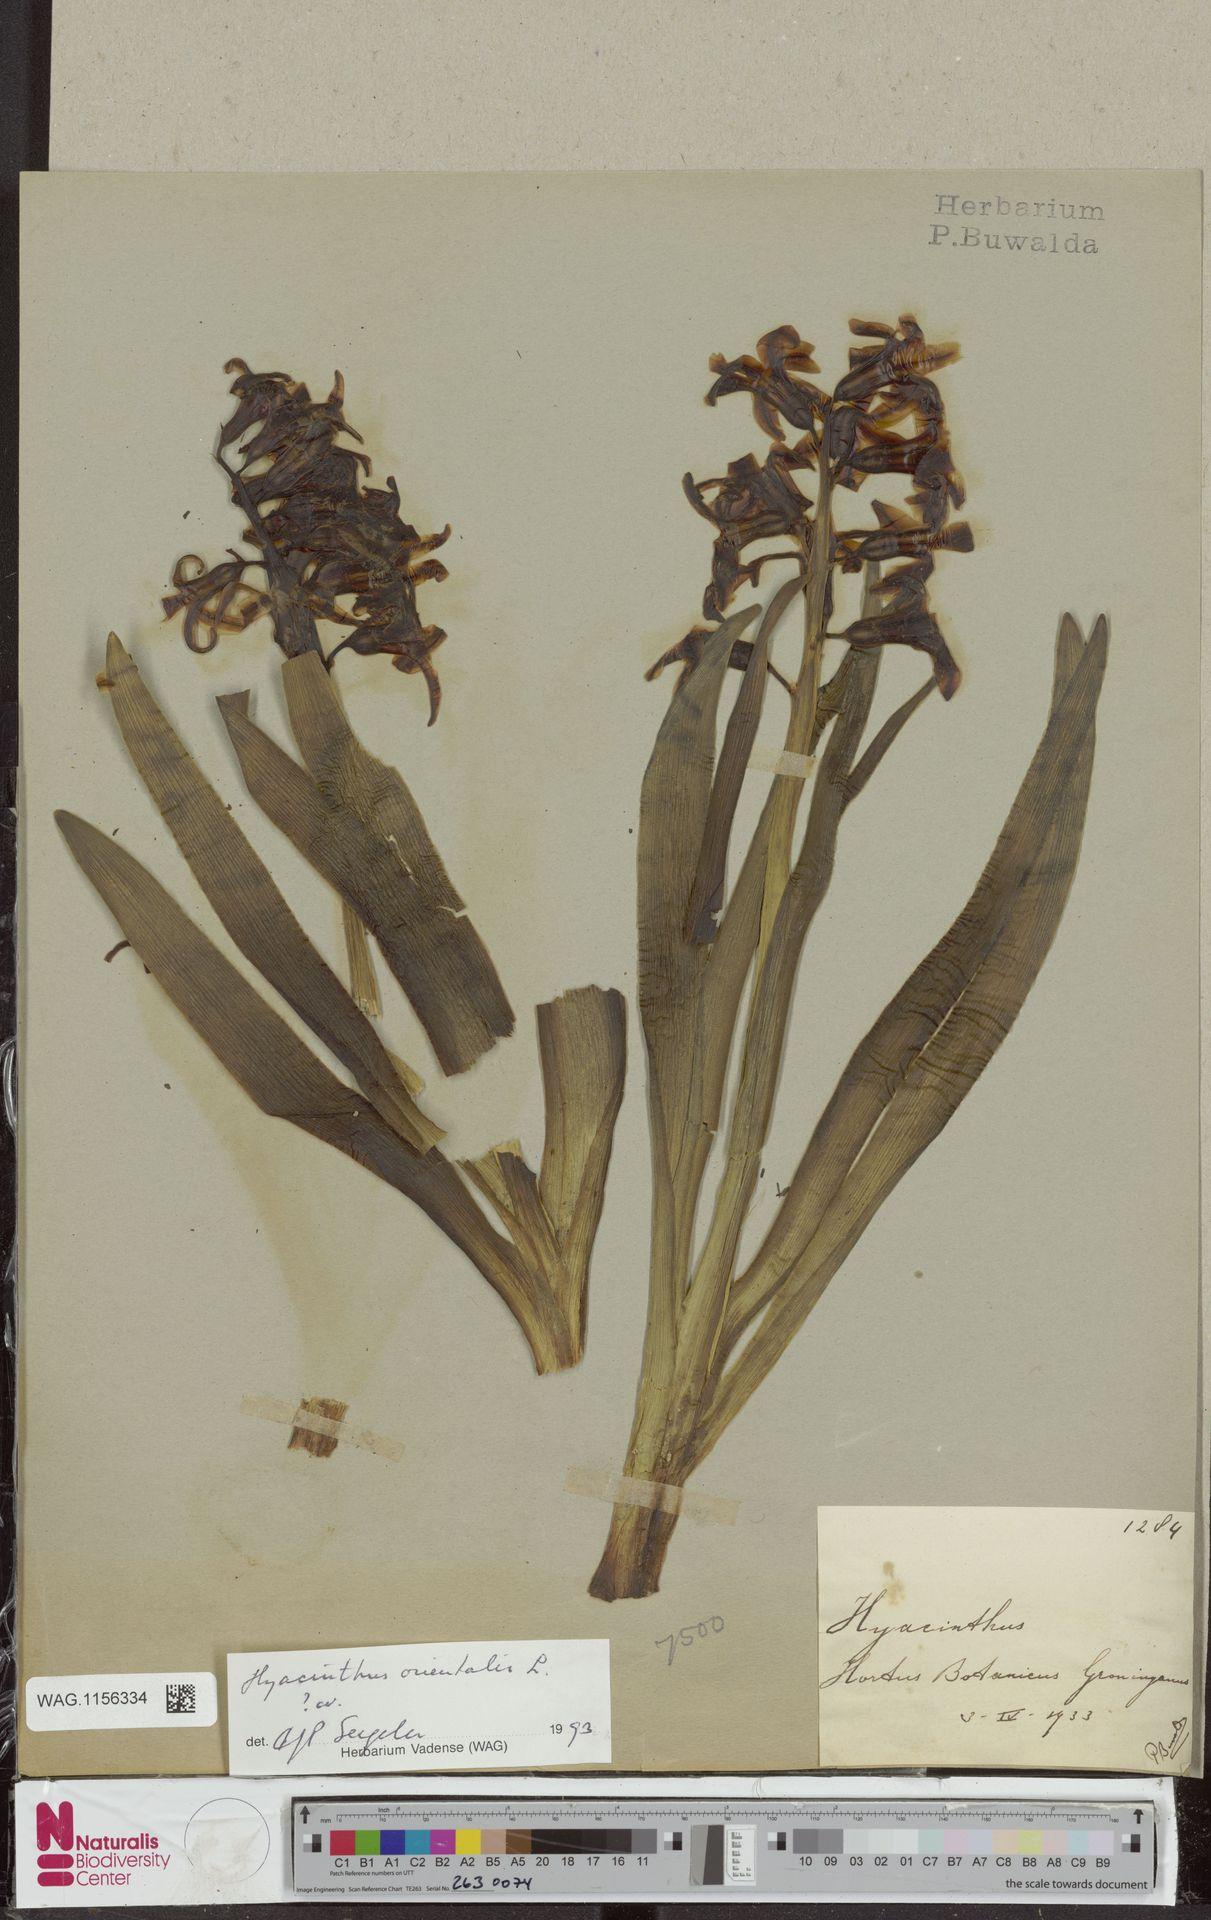 WAG.1156334   Hyacinthus orientalis L.